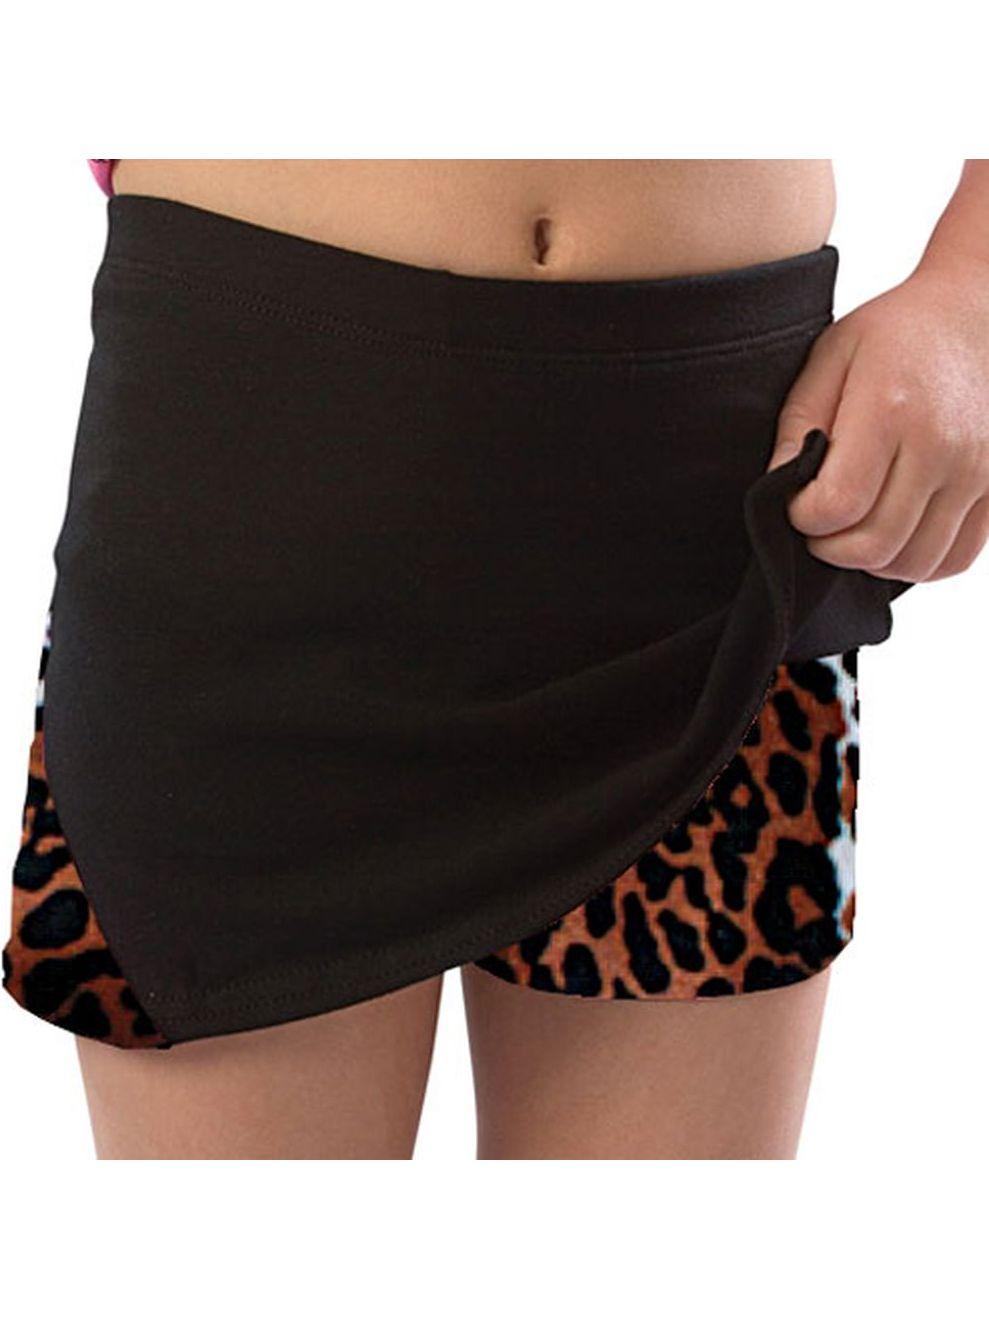 Pizzazz Girls Size 2T-16 Leopard Skirt With Boy Cut Shorts Dance Cheer